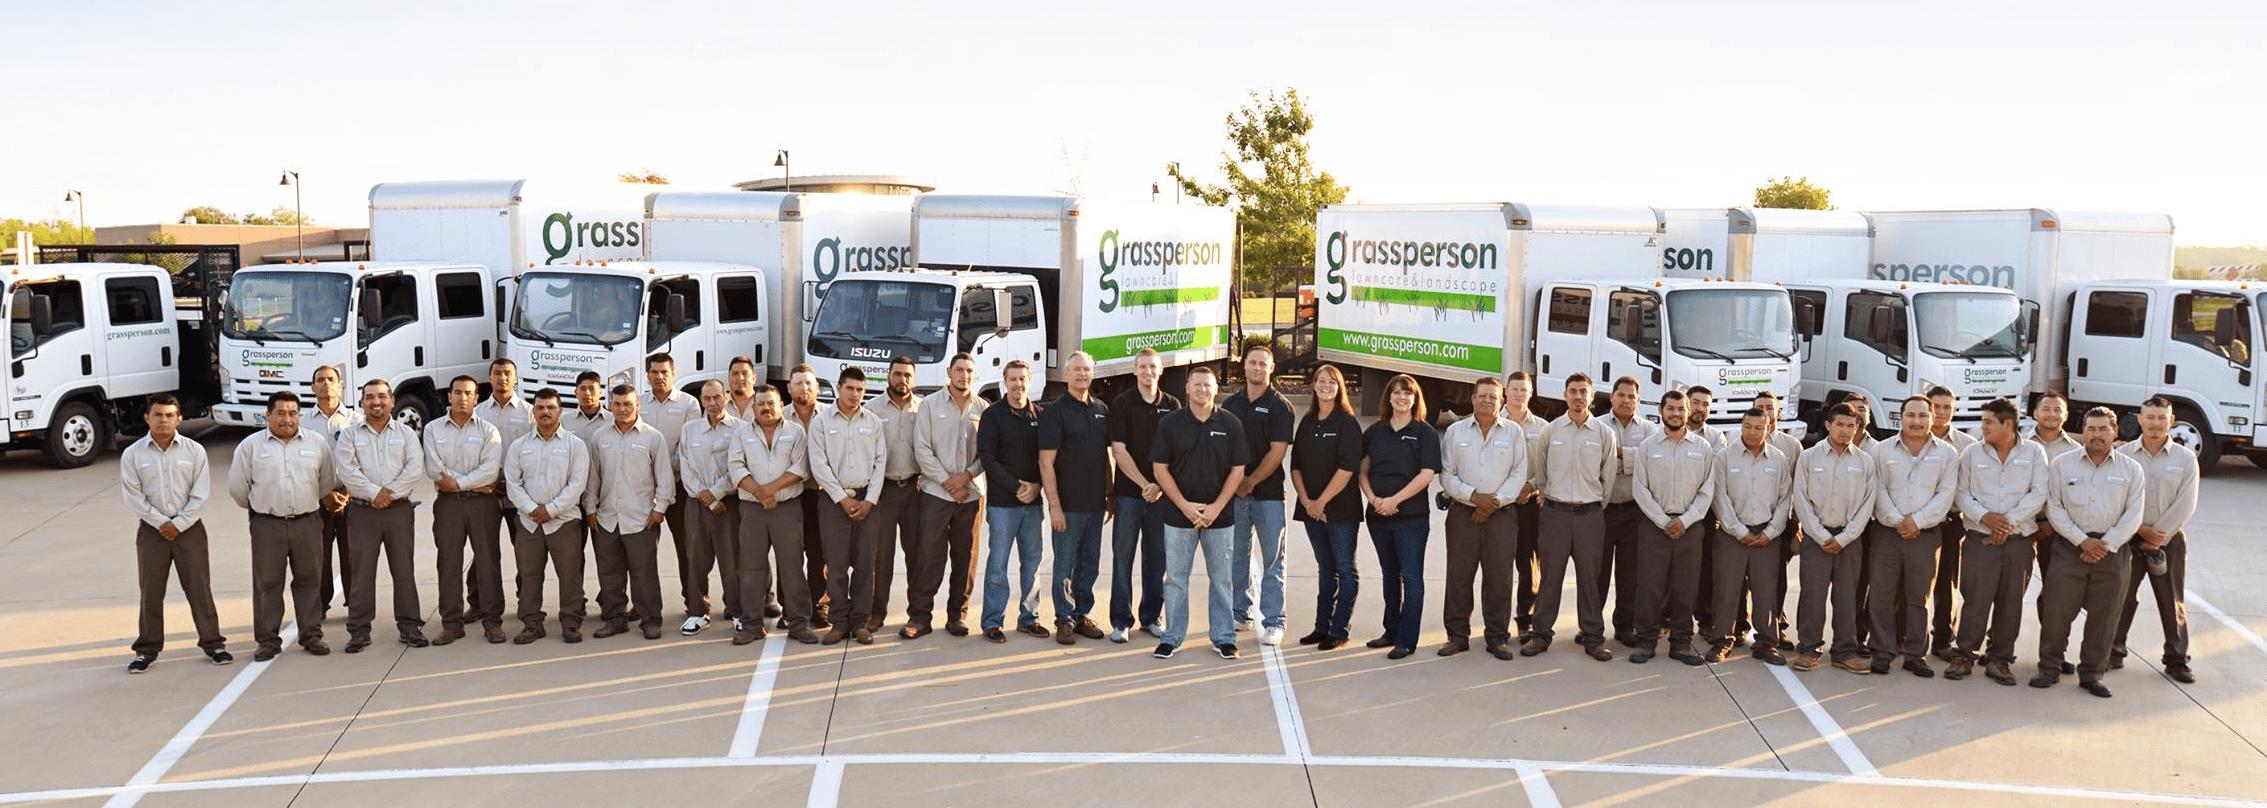 Grassperson Lawn Care team members